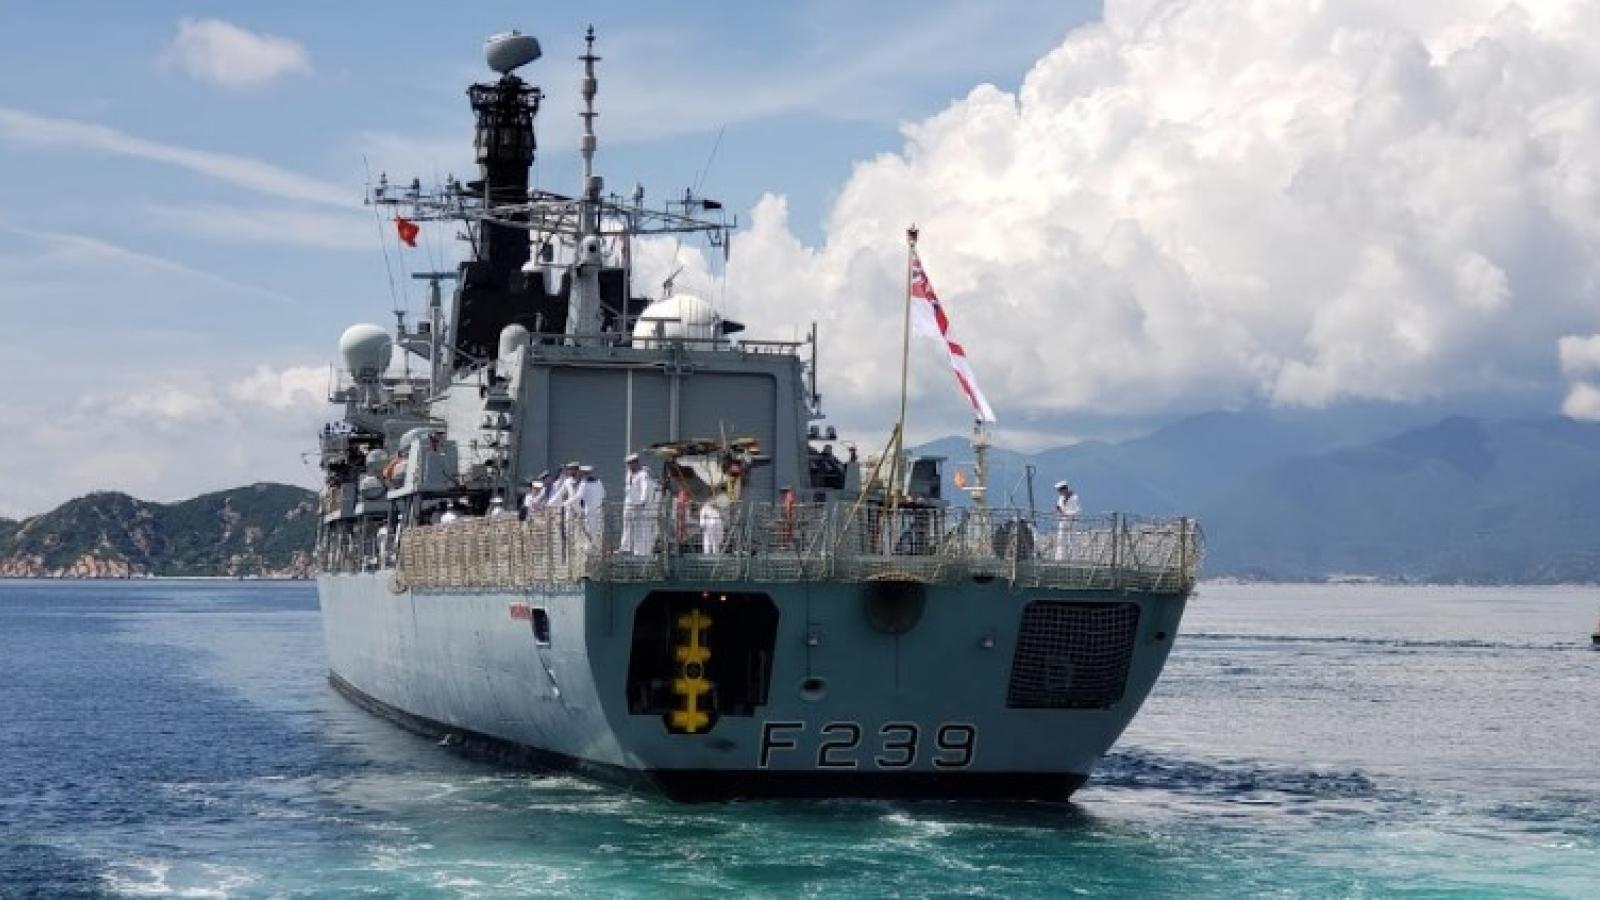 Royal Navy ship HMS Richmond visits Vietnam